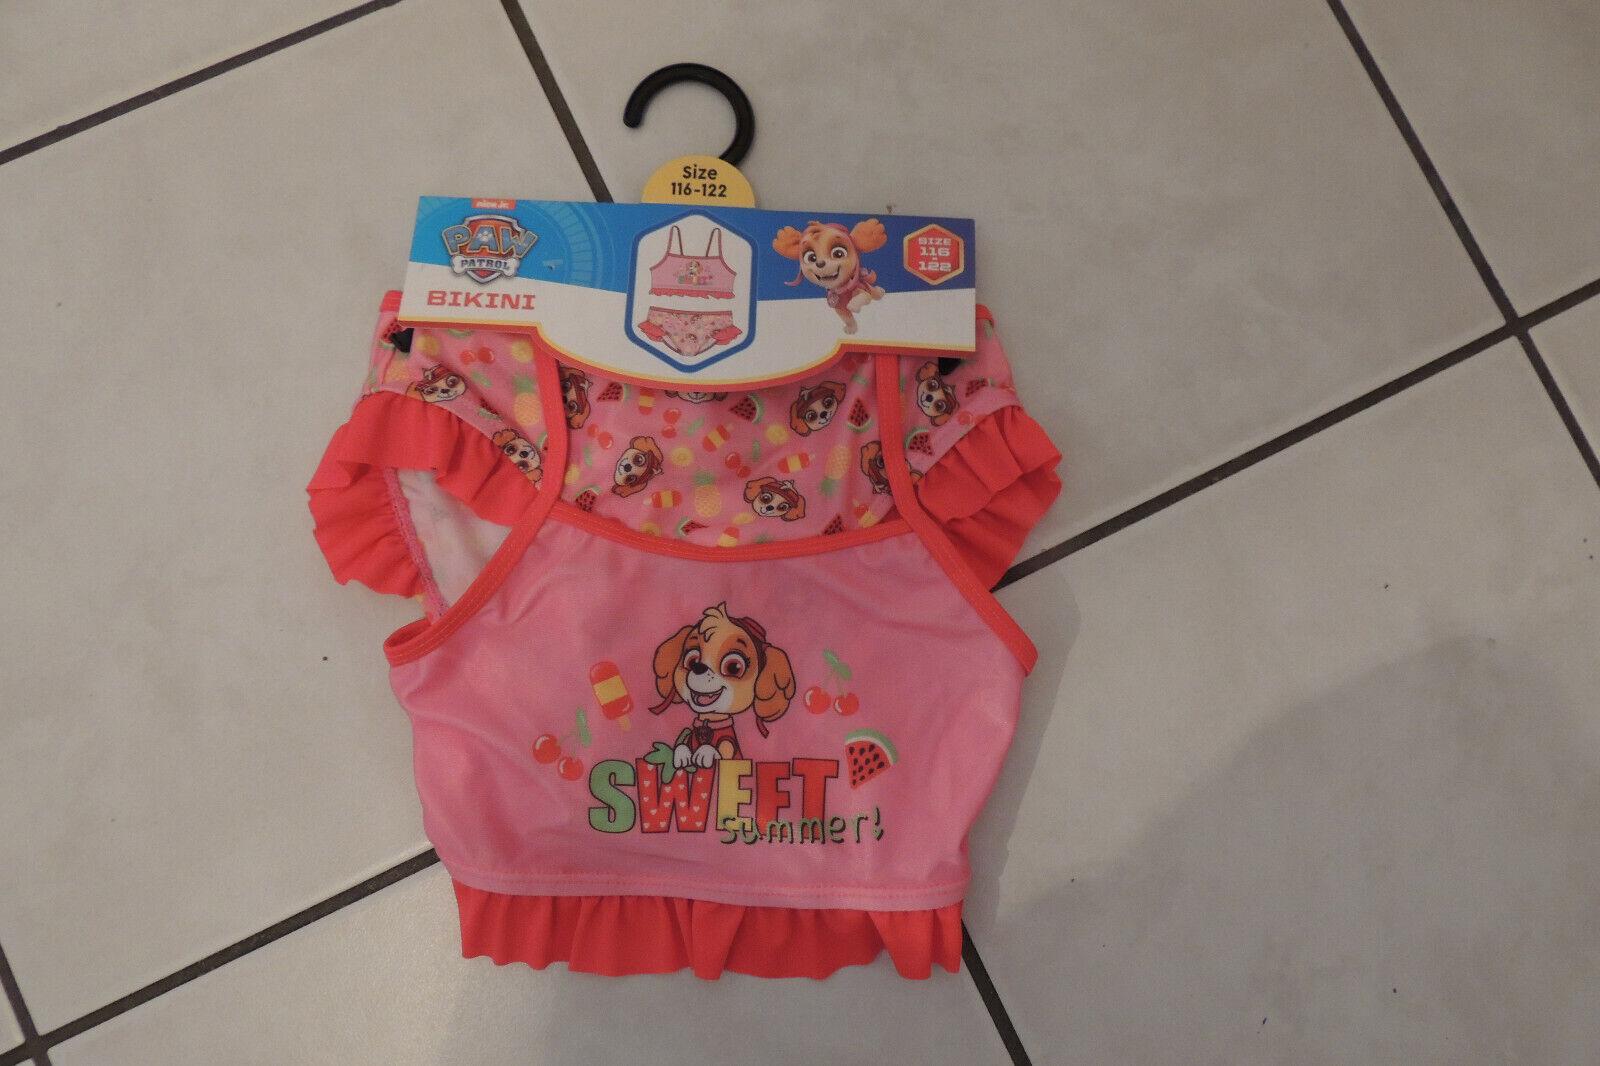 Bikini Swimsuit Mädchen Sommer Badeanzug Paw Patrol Gr 92,98,104,110,116,122 Neu